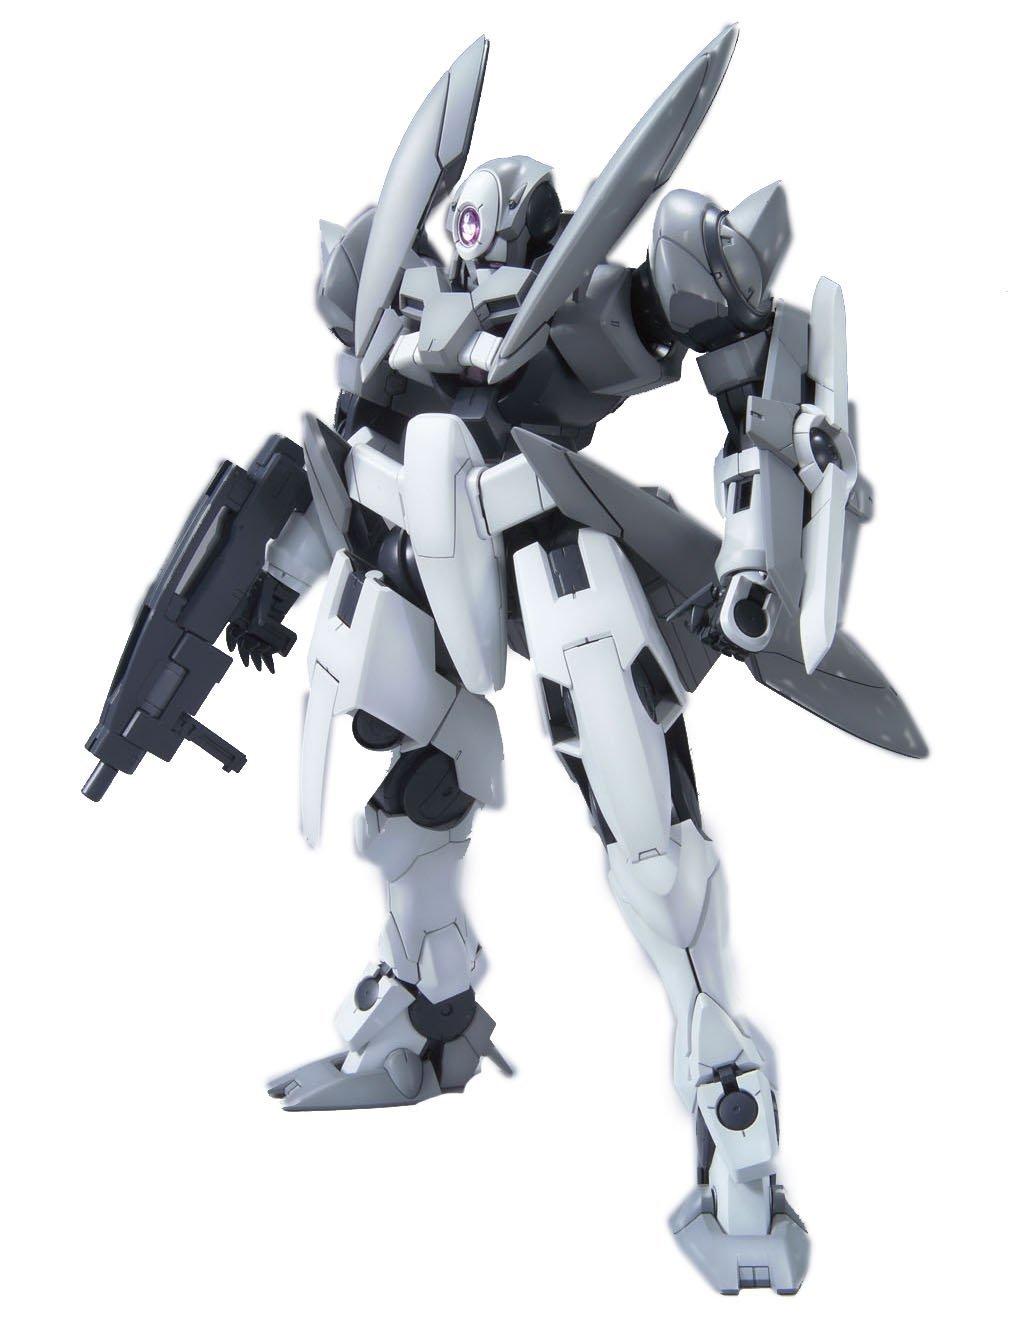 Gundam Master Grade Gundam 00 1/100 Scale Model Kit: GNX-603T GN-X